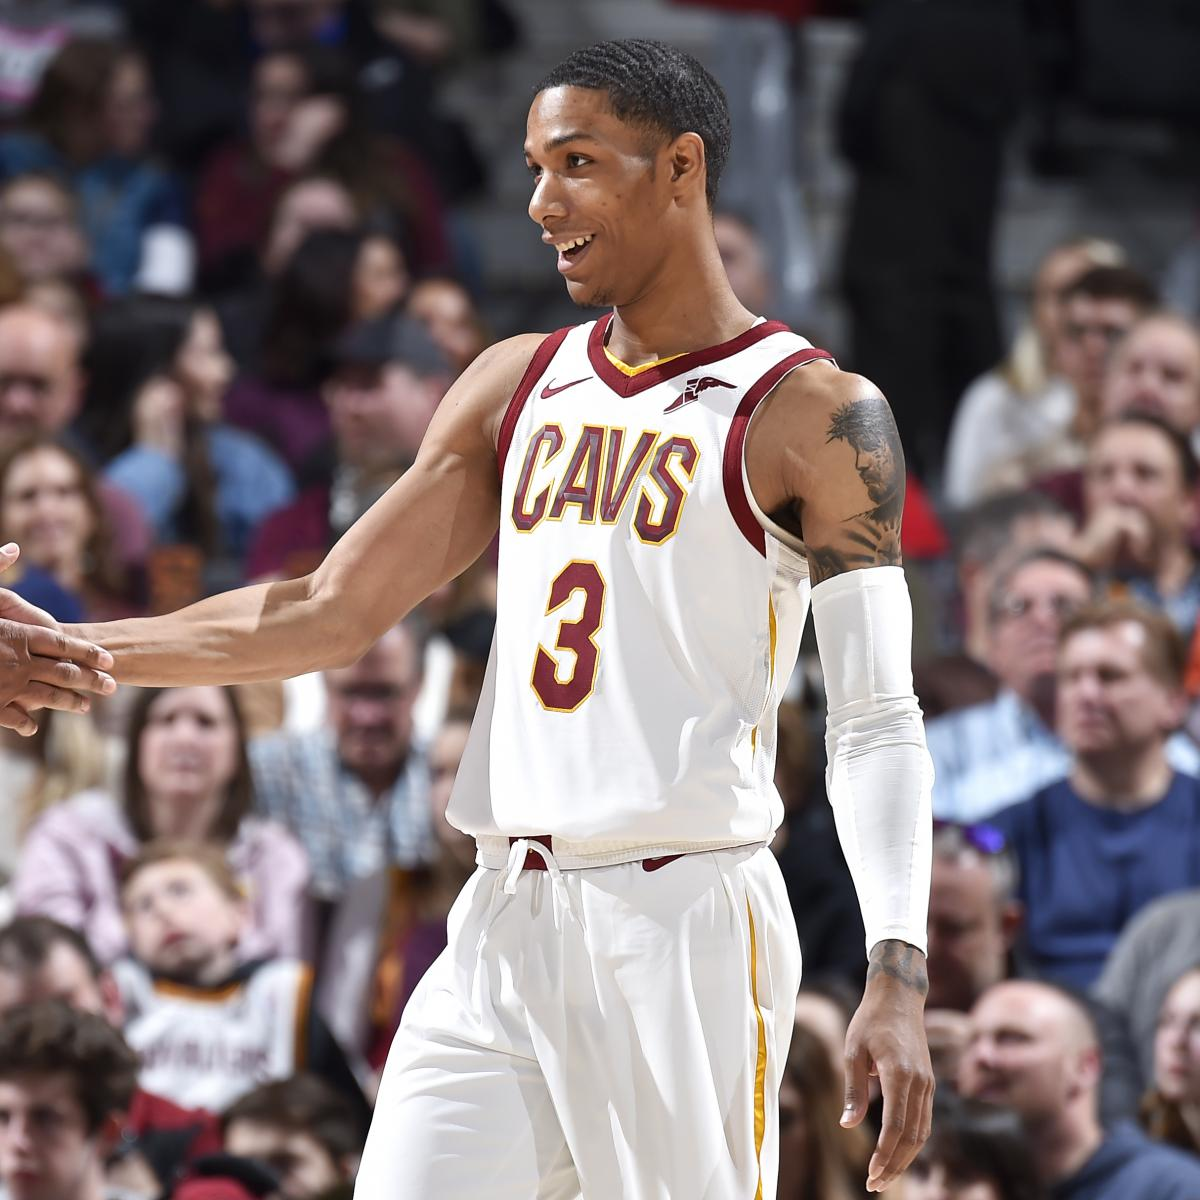 NBA Rumors: Cavaliers To Waive Patrick McCaw, Sign Cameron